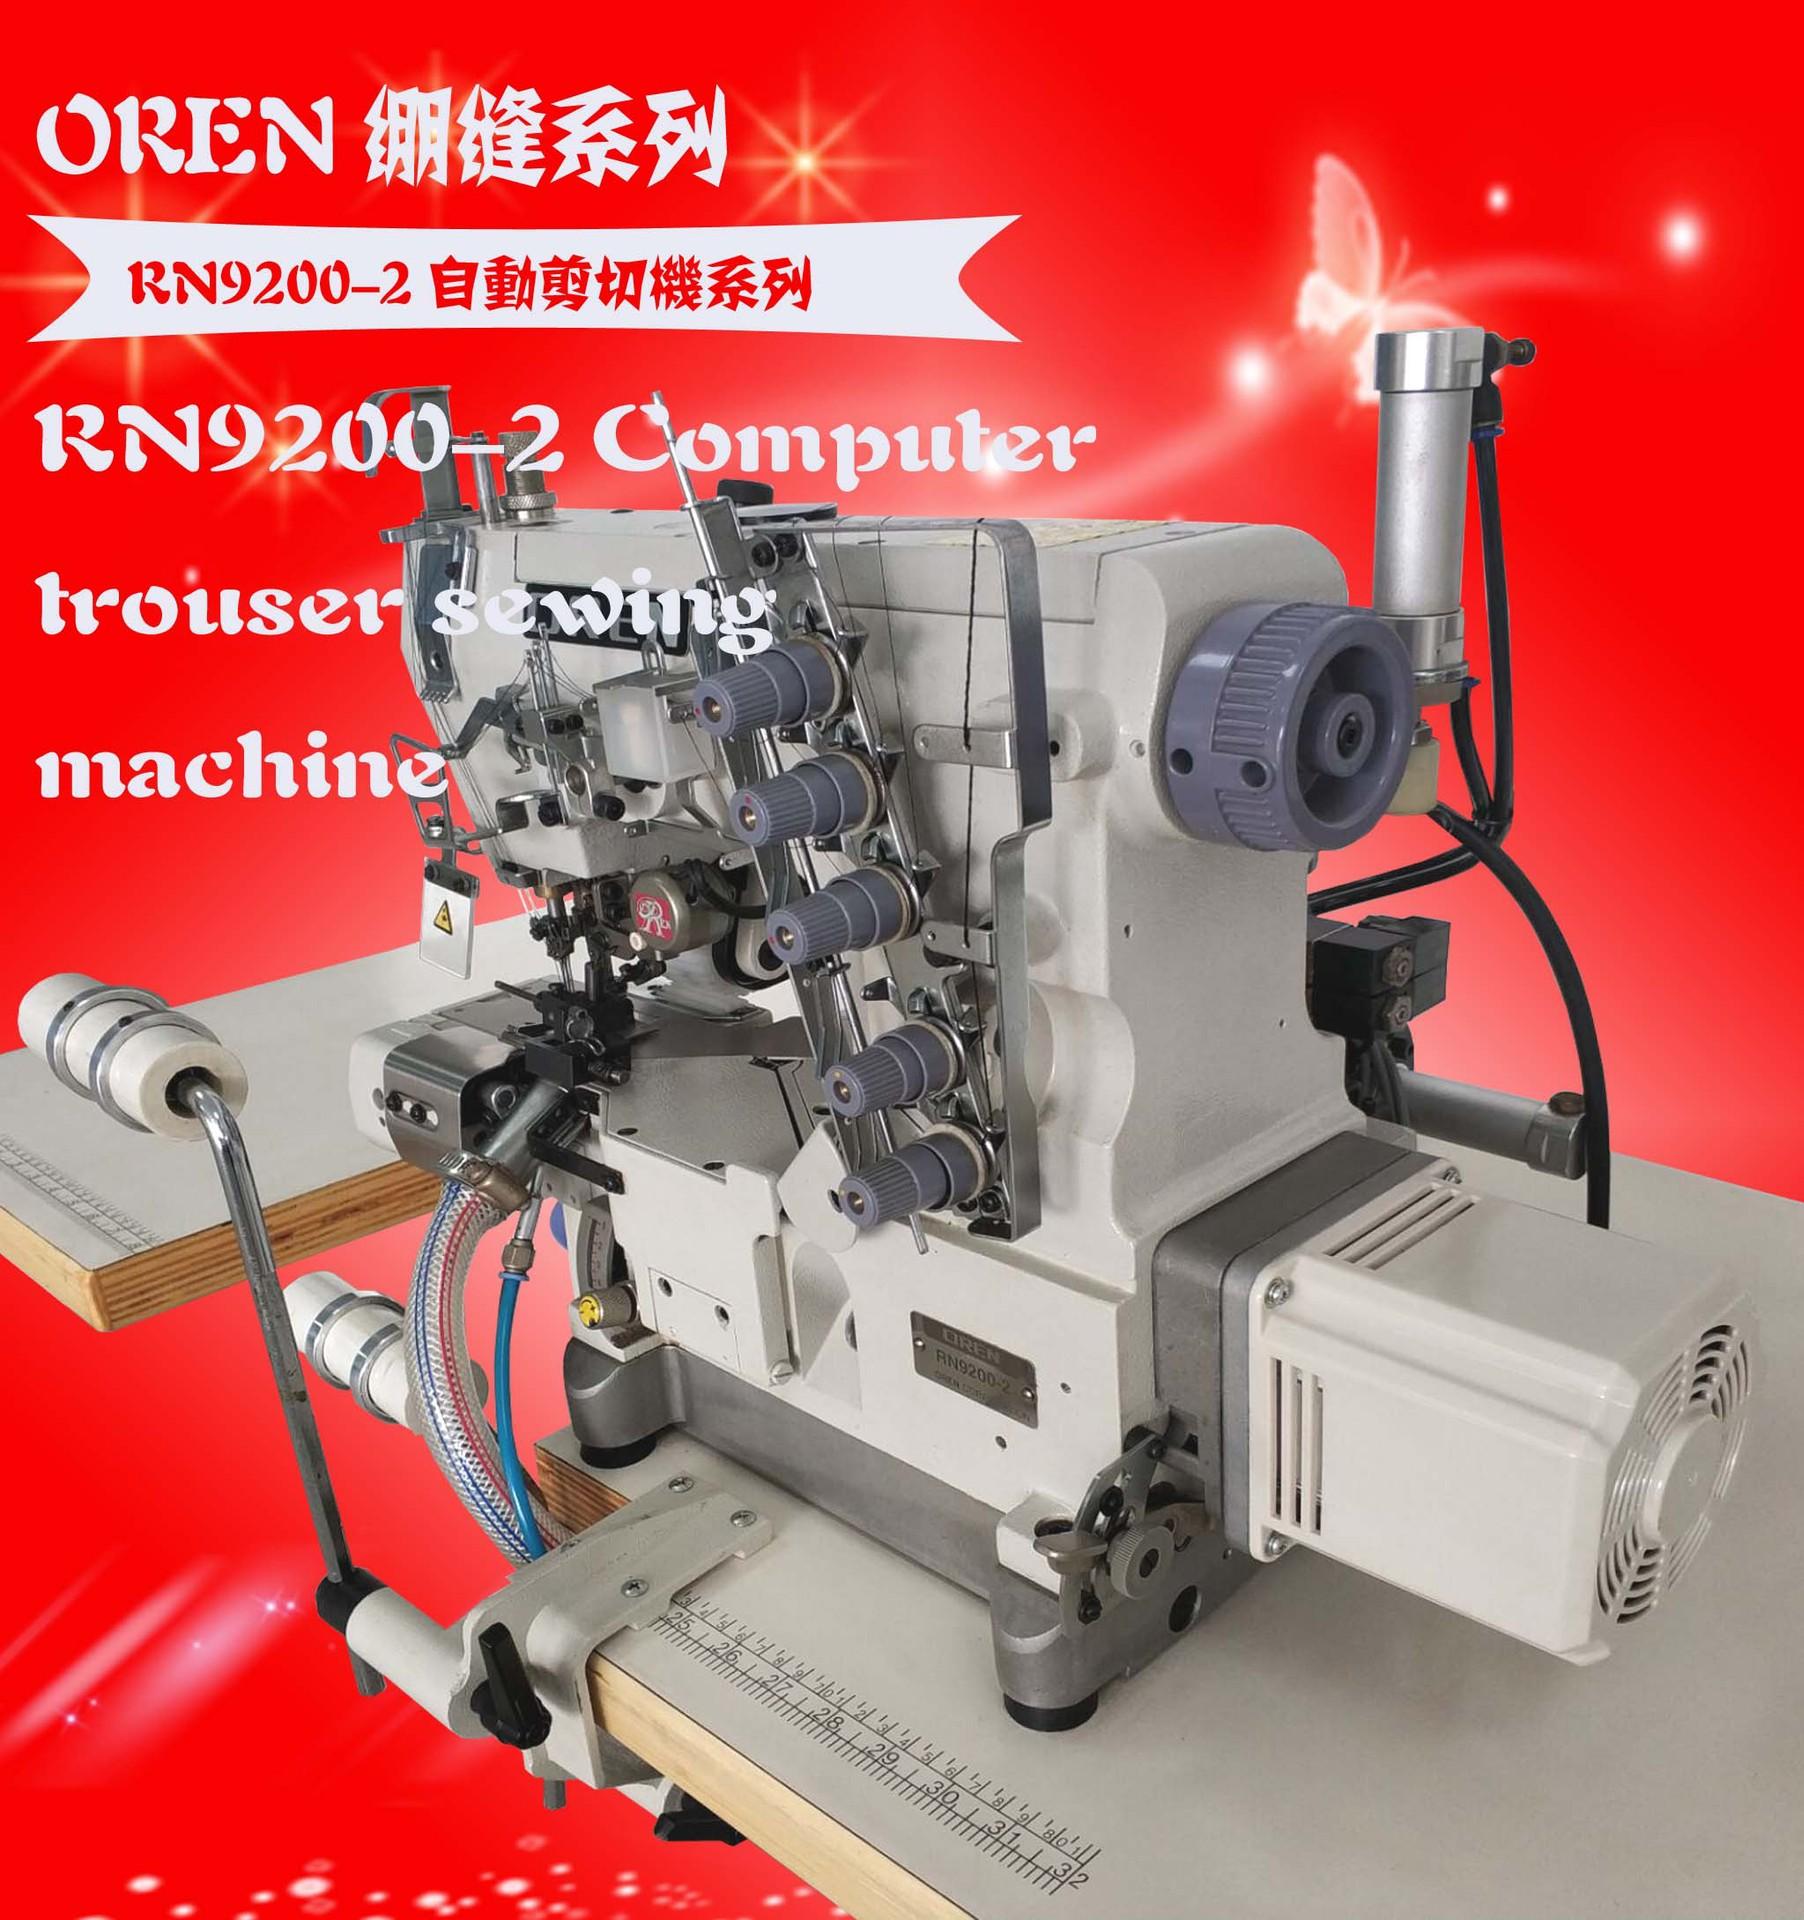 RN9200-2